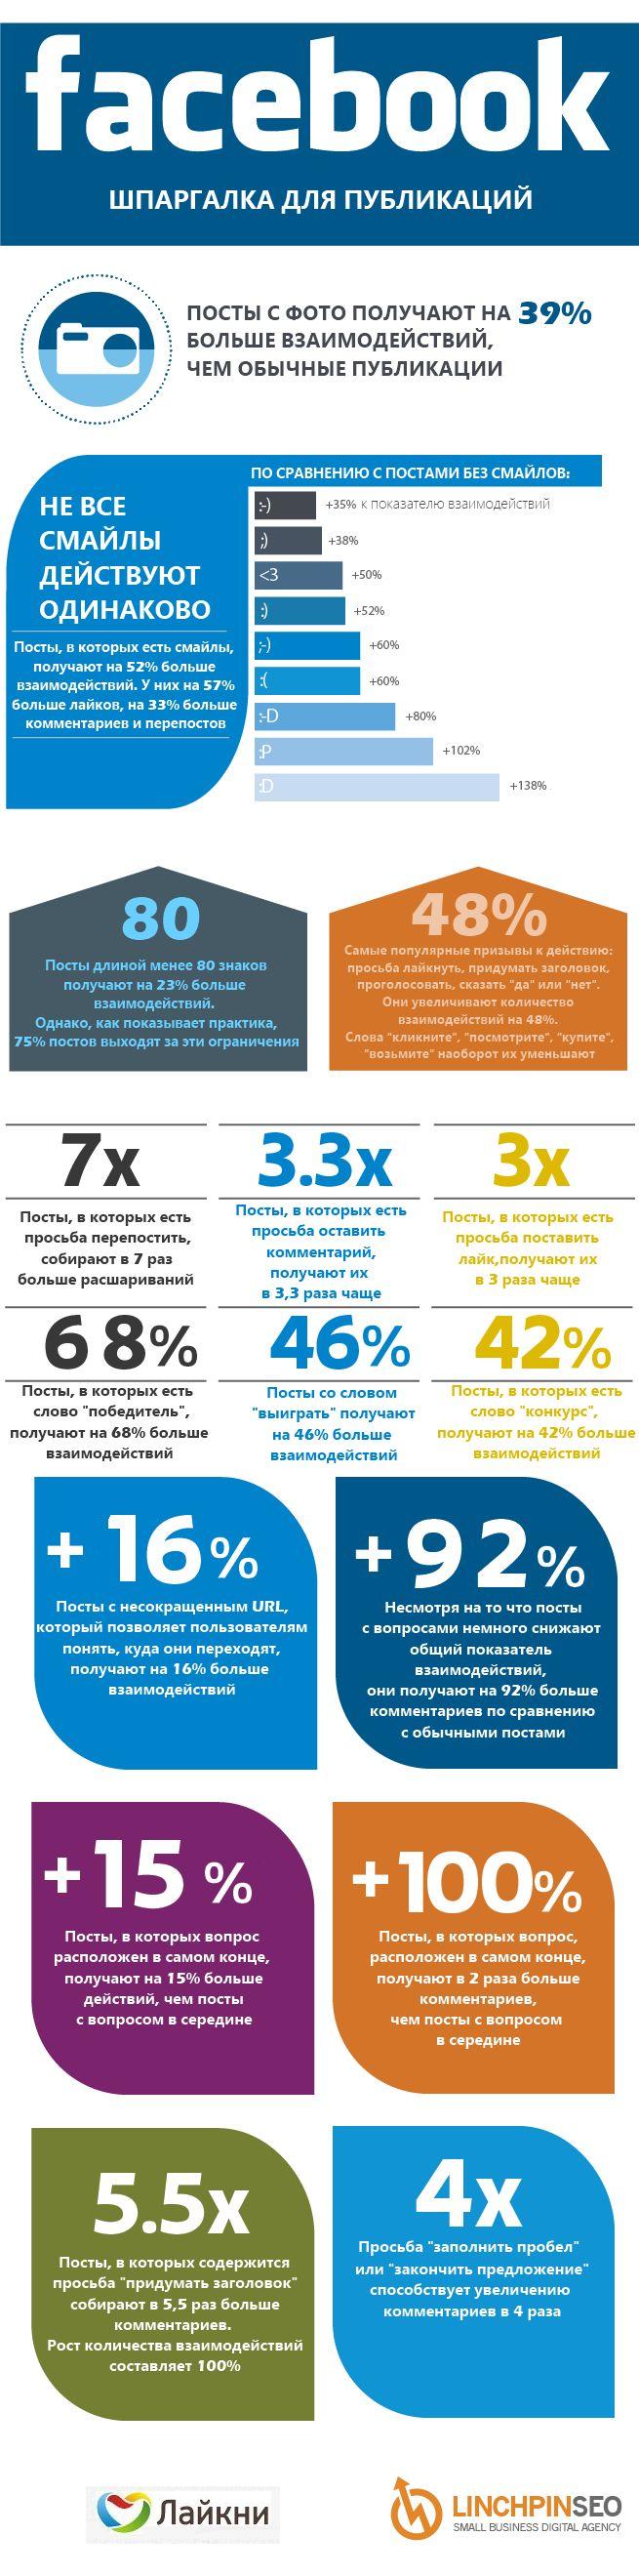 Инфографика: cекрет успеха поста на Facebook